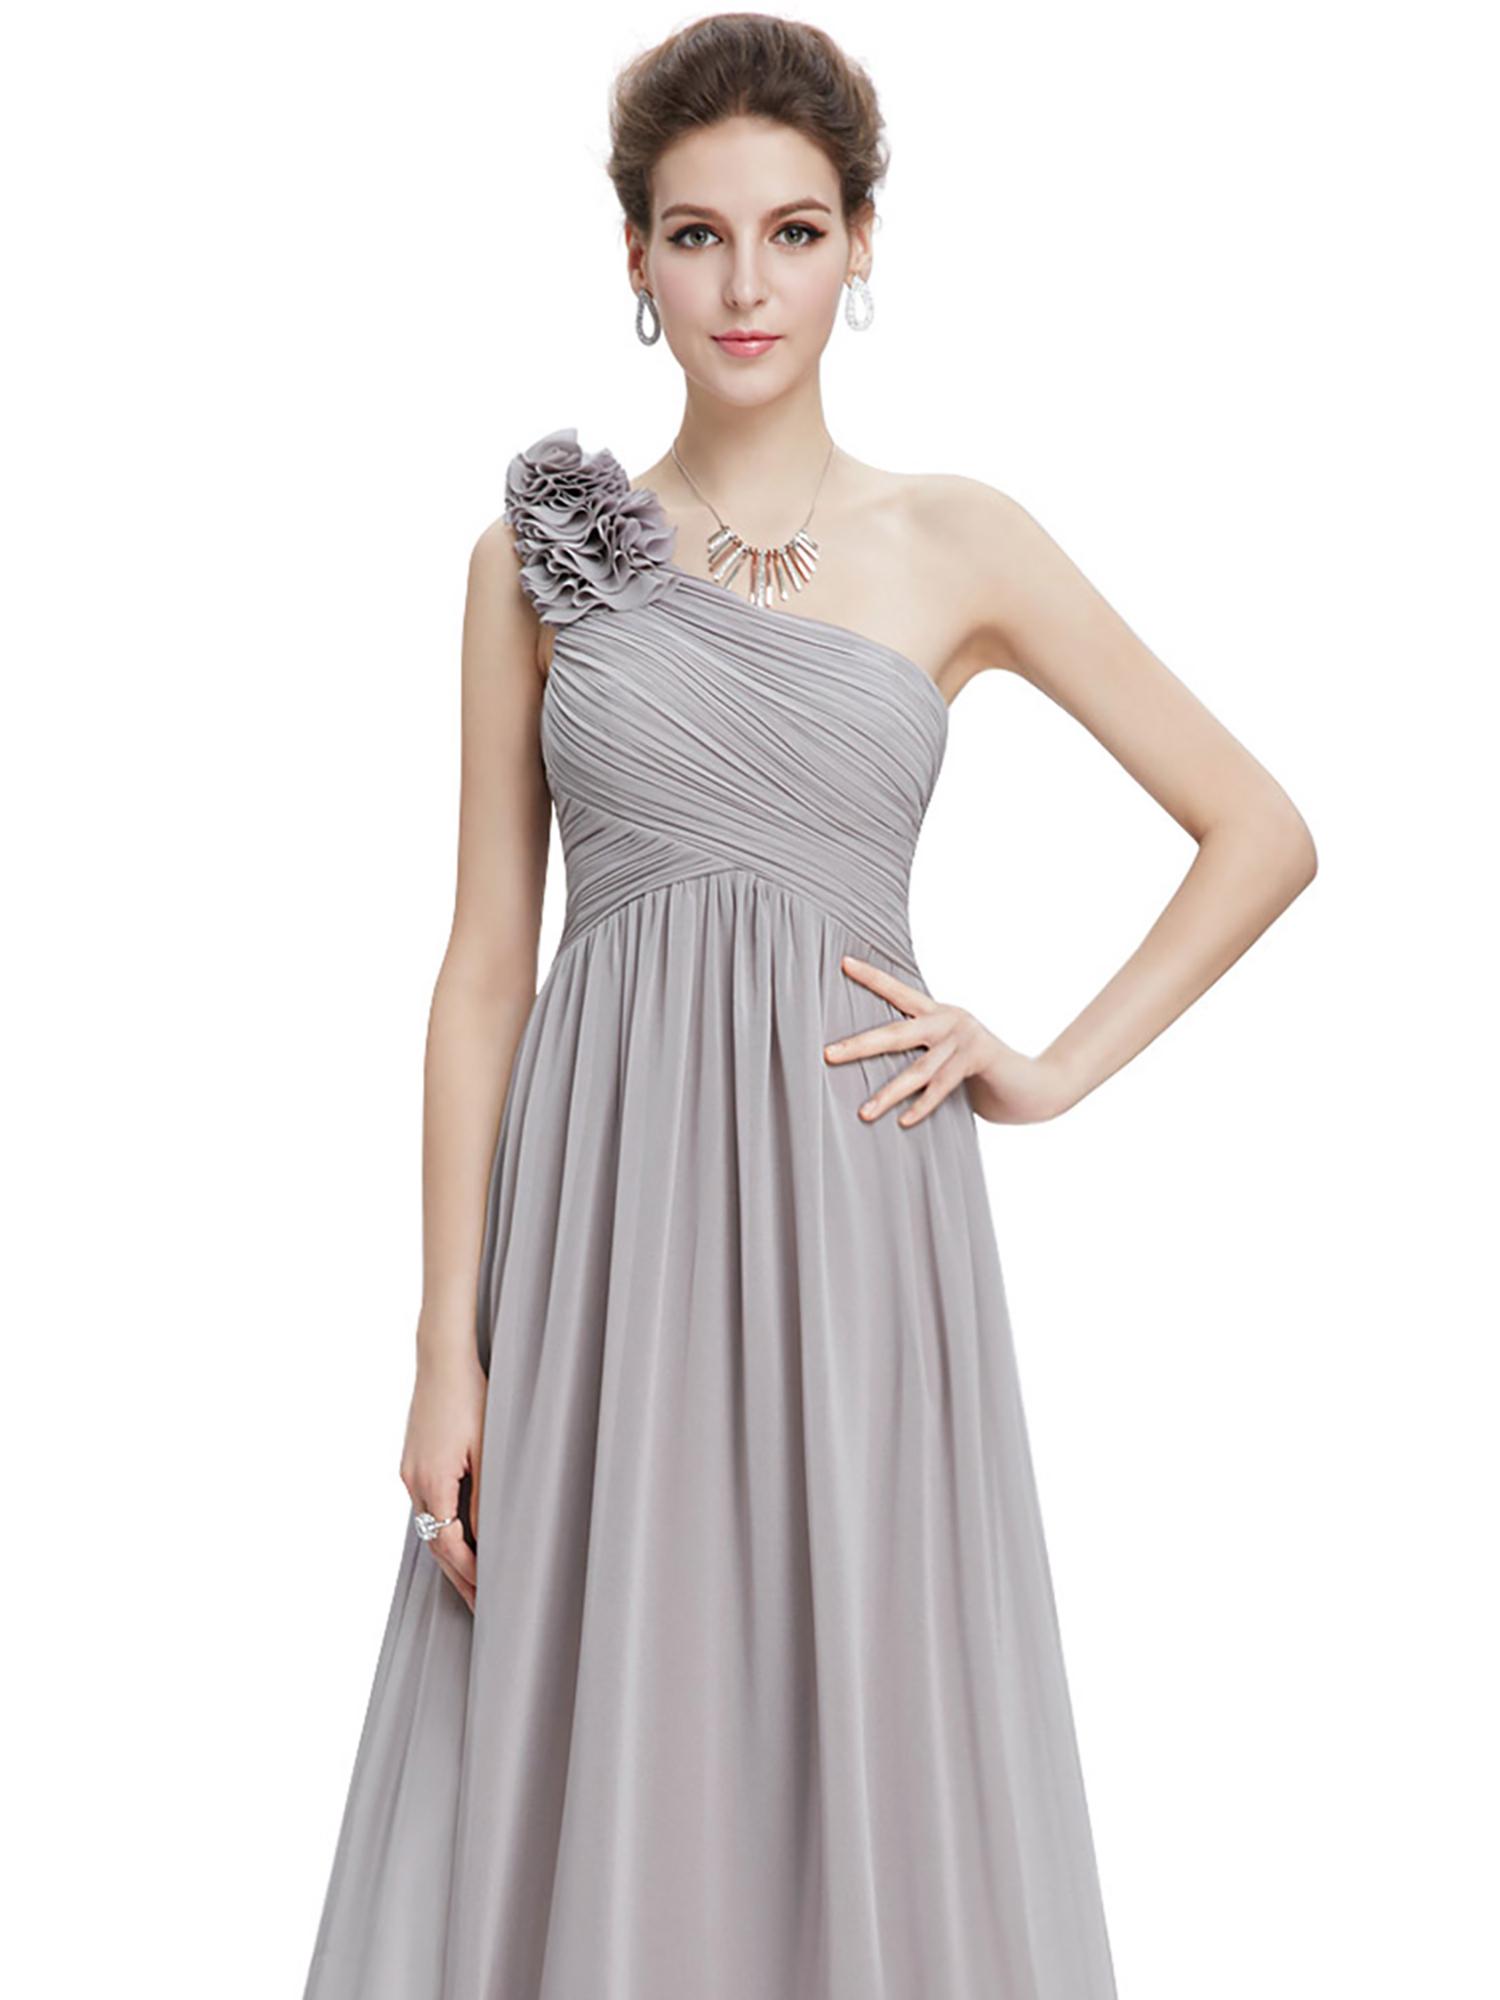 Ever-Pretty-US-Long-Bridesmaid-Dresses-One-Shoulder-Evening-Party-Dresses-08237 thumbnail 30